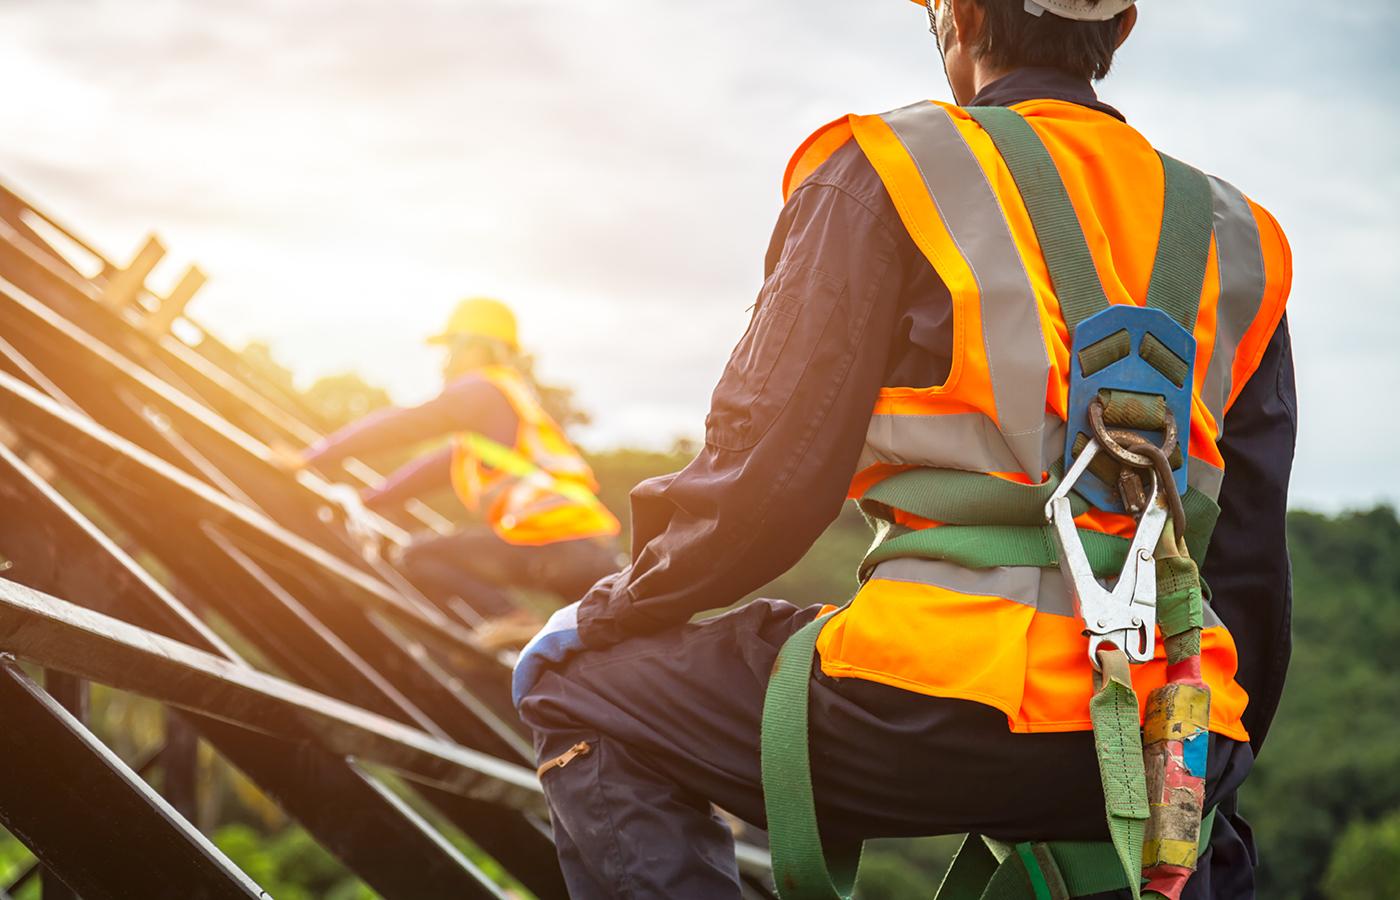 Factores para prevenir riesgos laborales